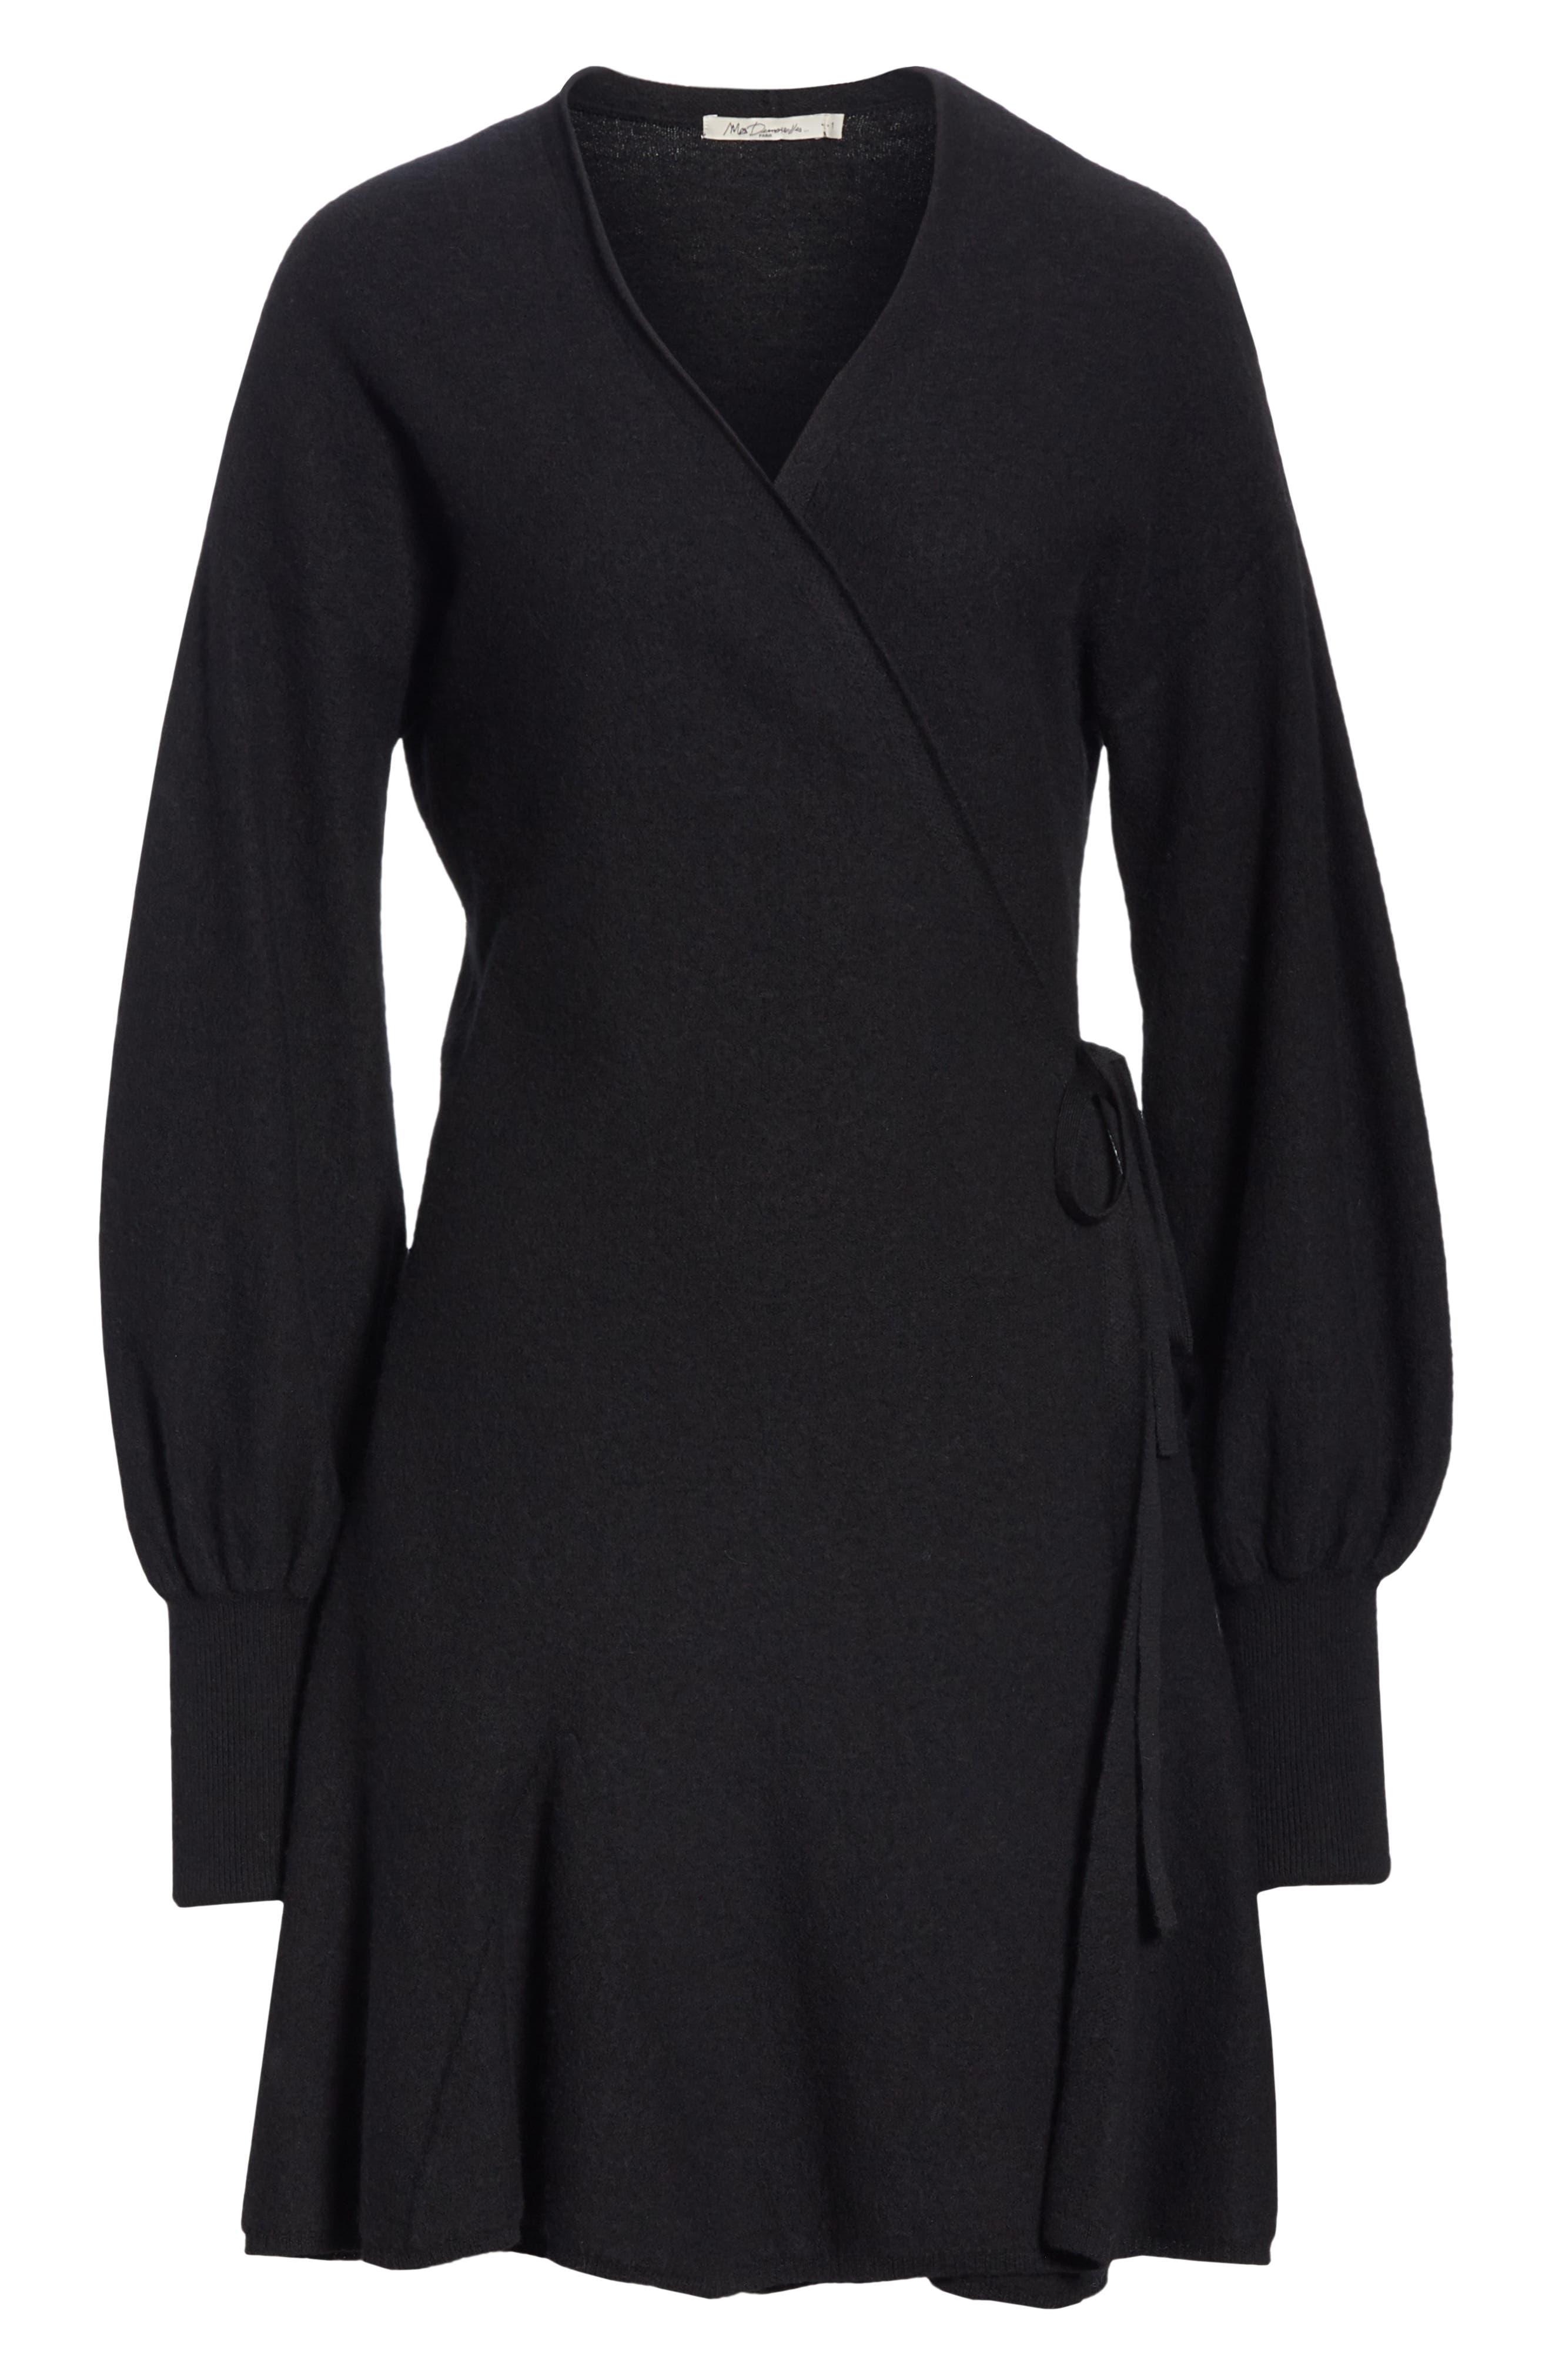 Sevilla Wool Felt Dress,                             Alternate thumbnail 7, color,                             BLACK